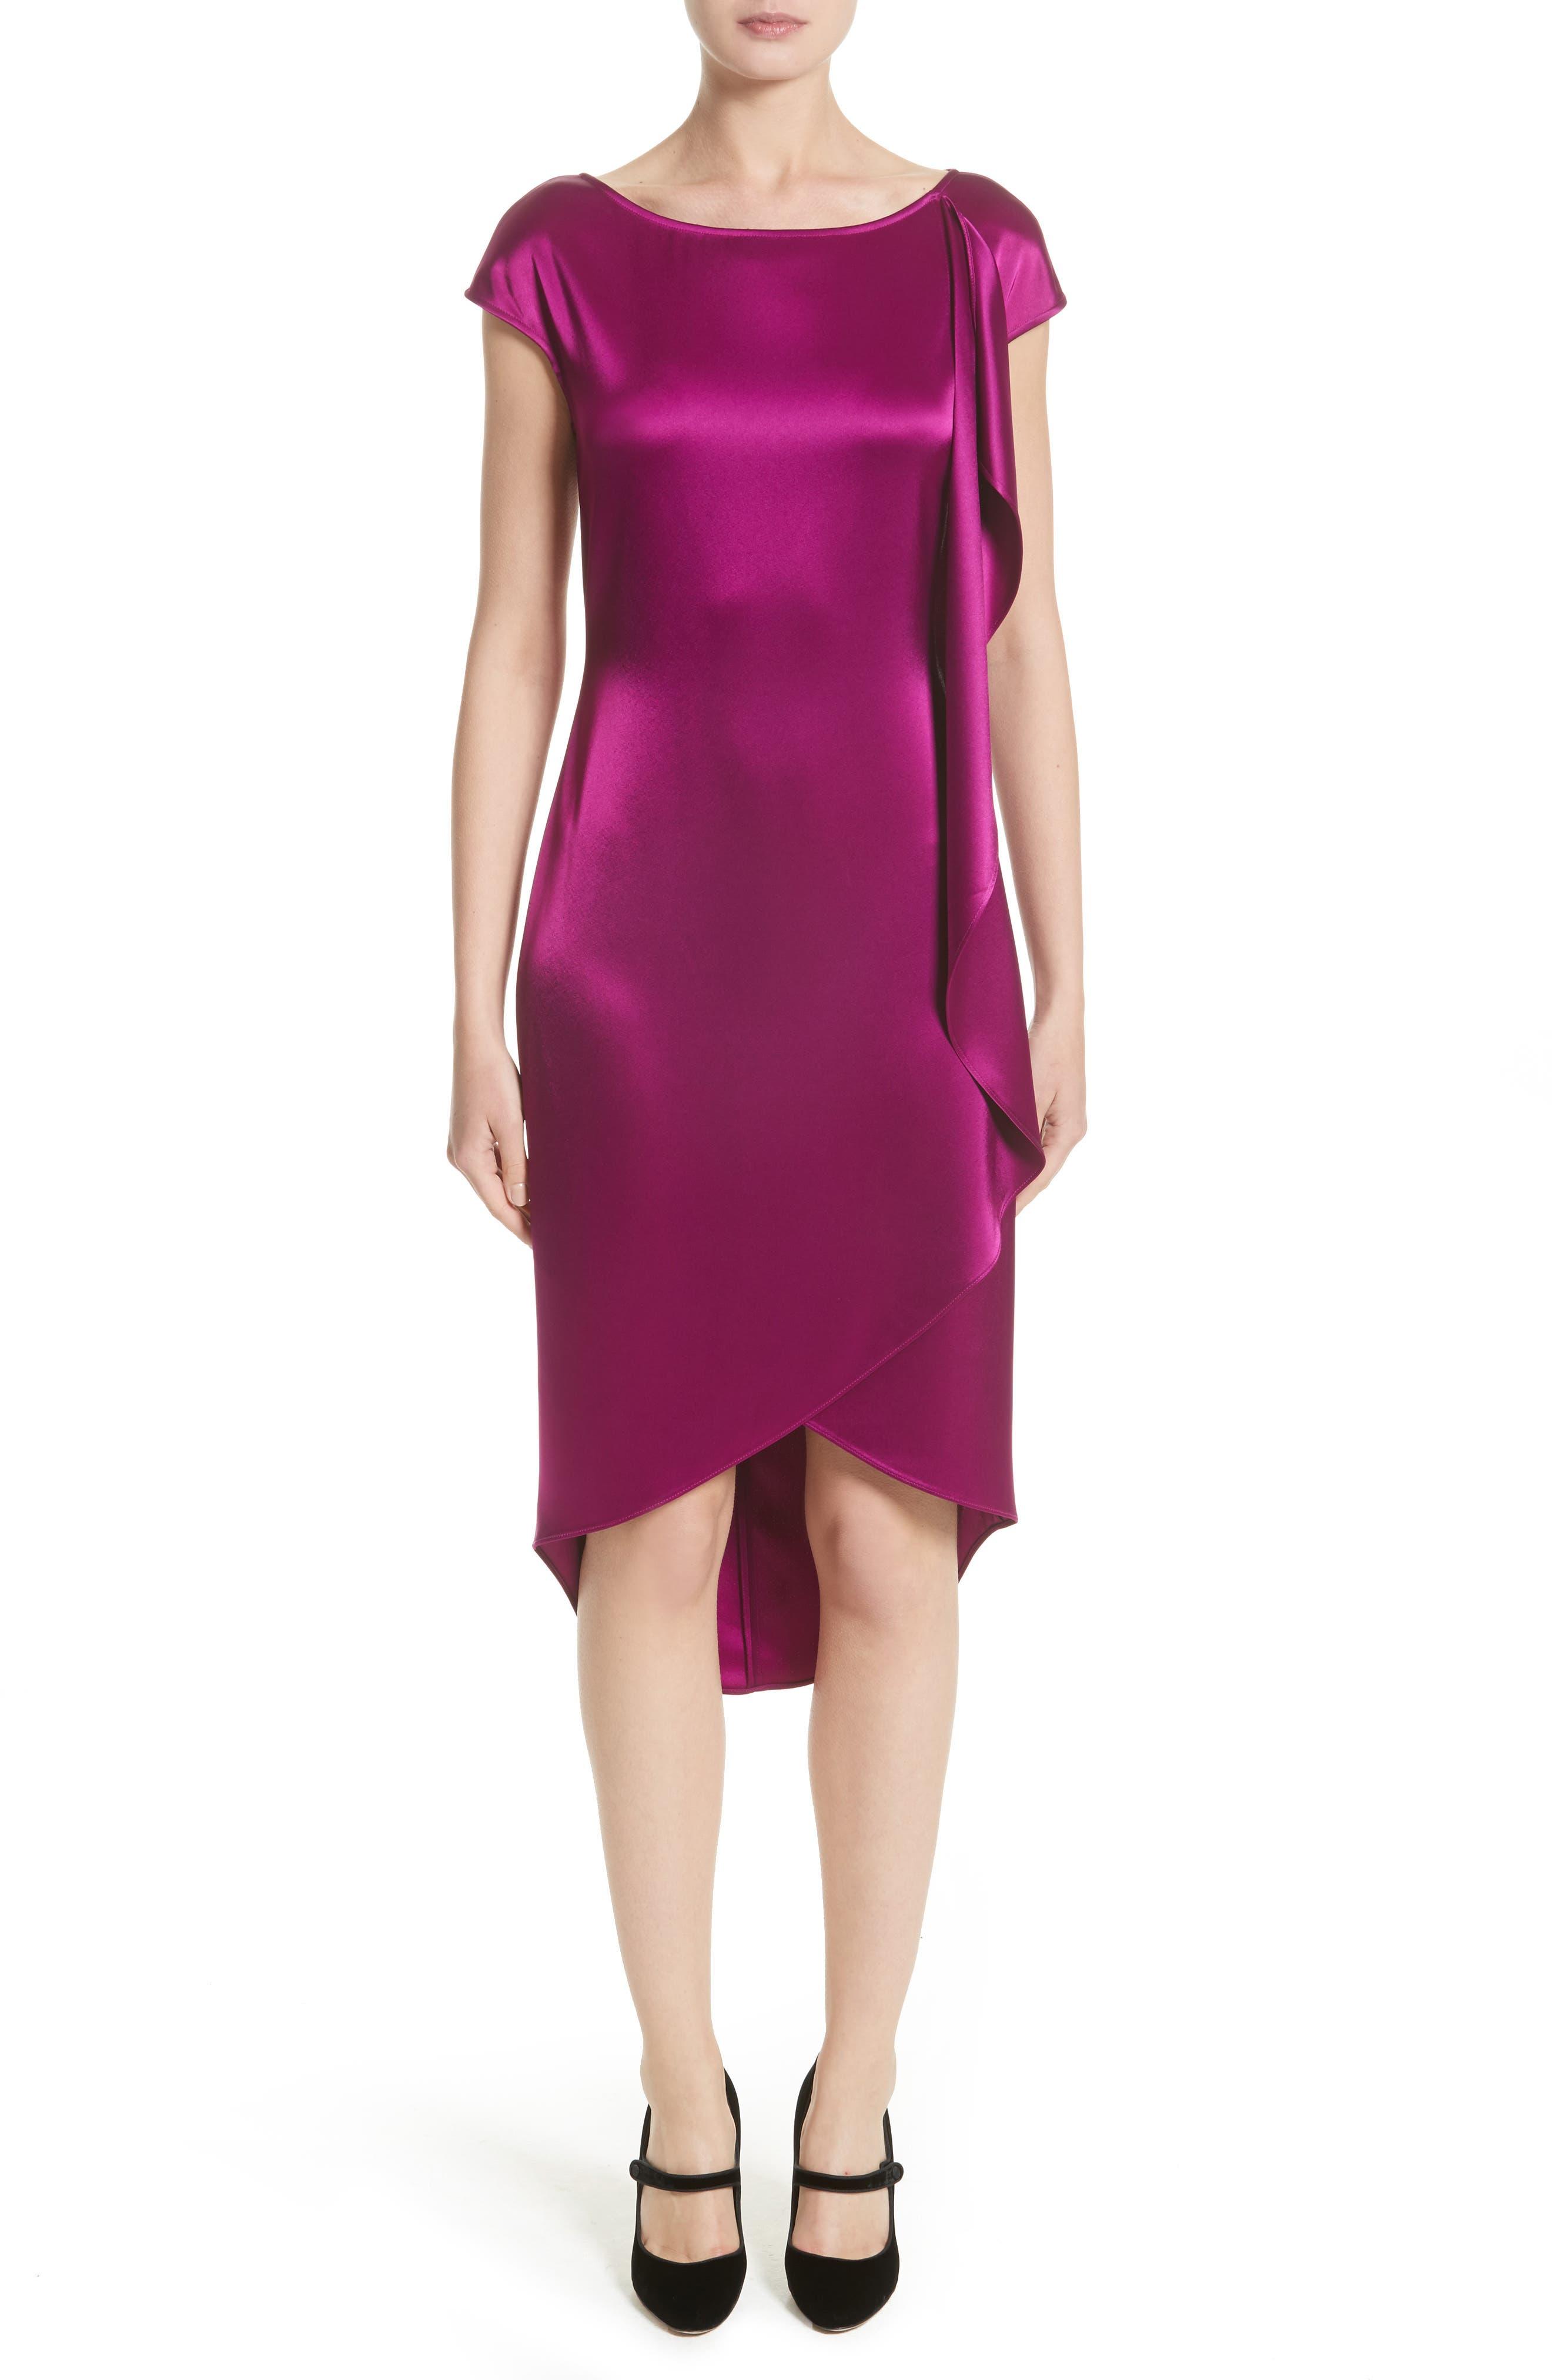 St. John Collection Liquid Satin Dress